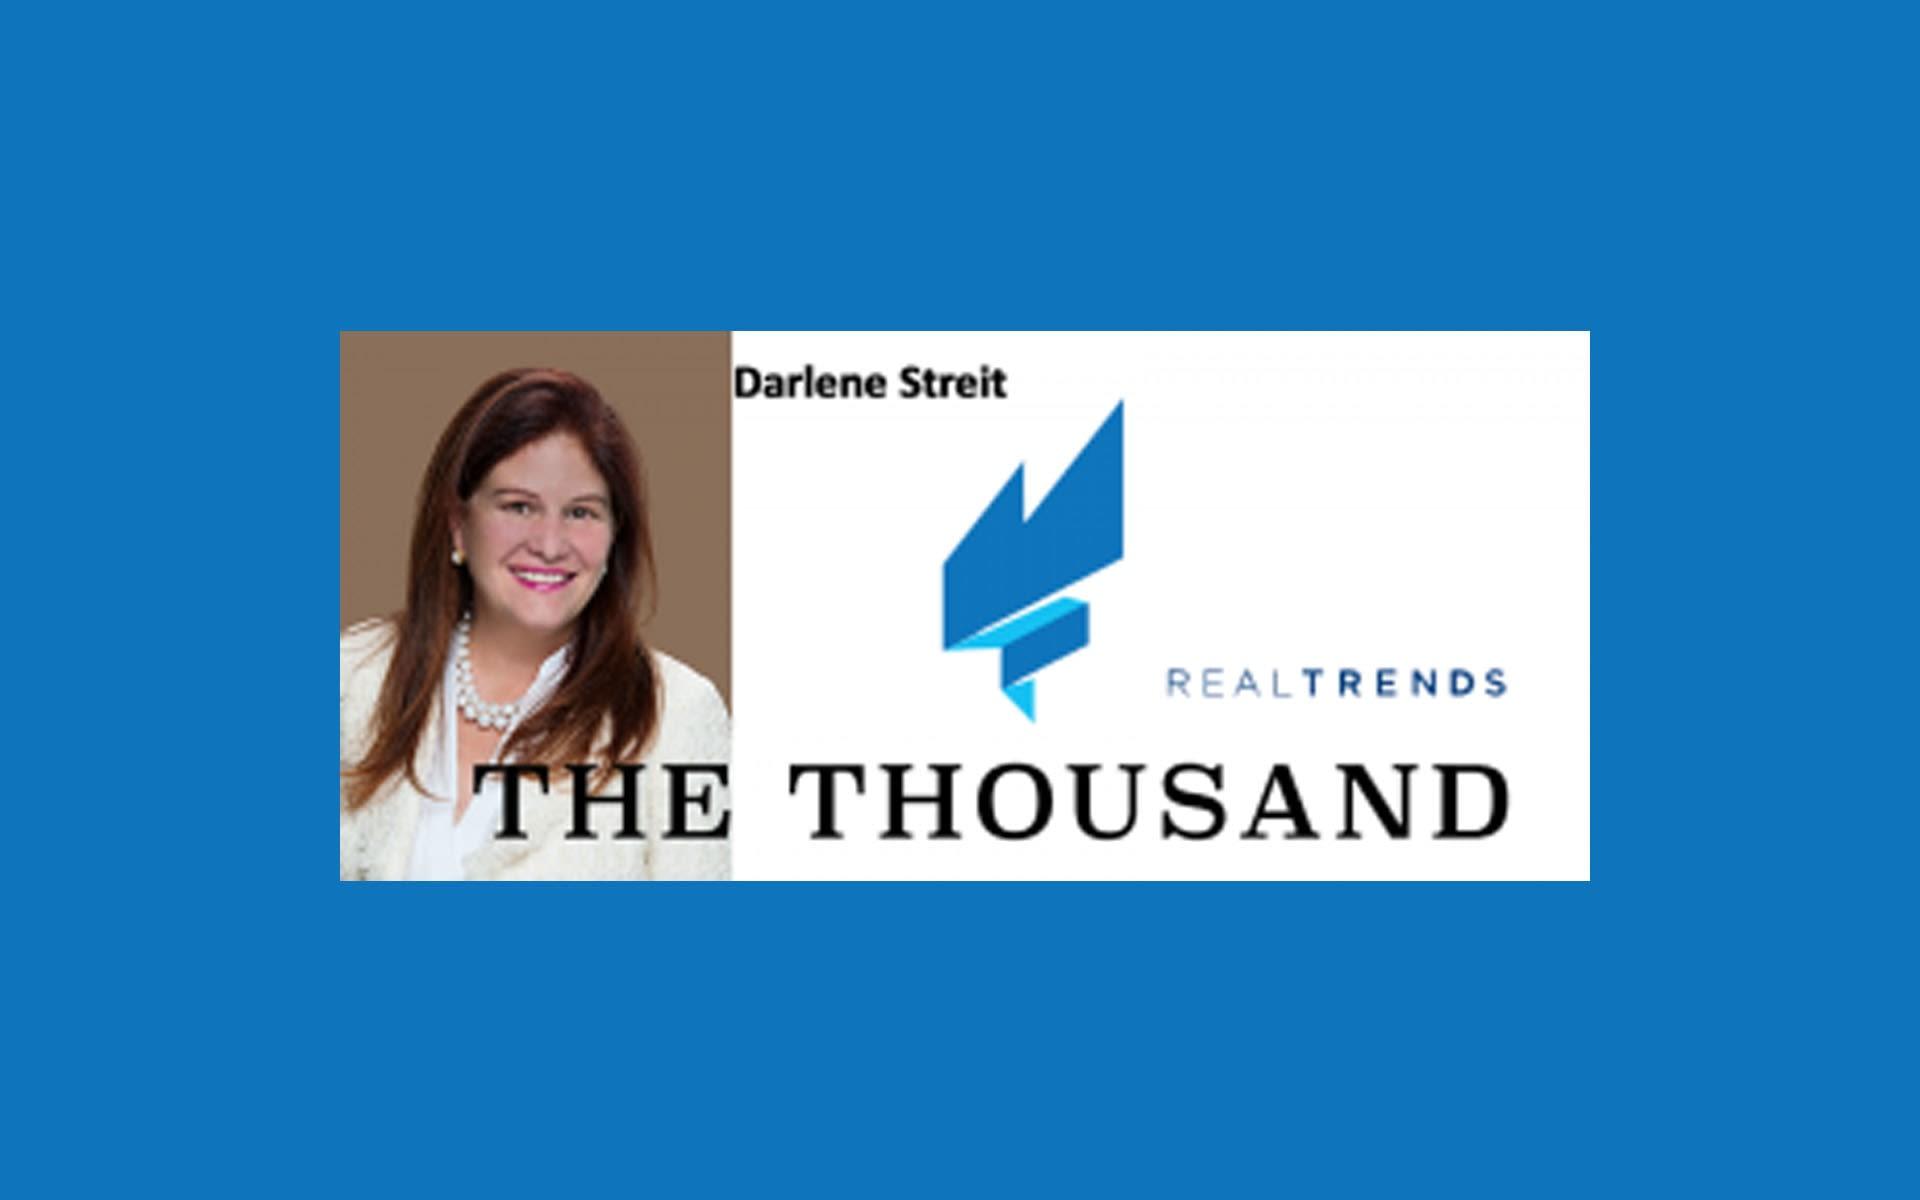 Darlene Streit – Santa Fe Real Estate Agent – Makes Elite List of Brokers